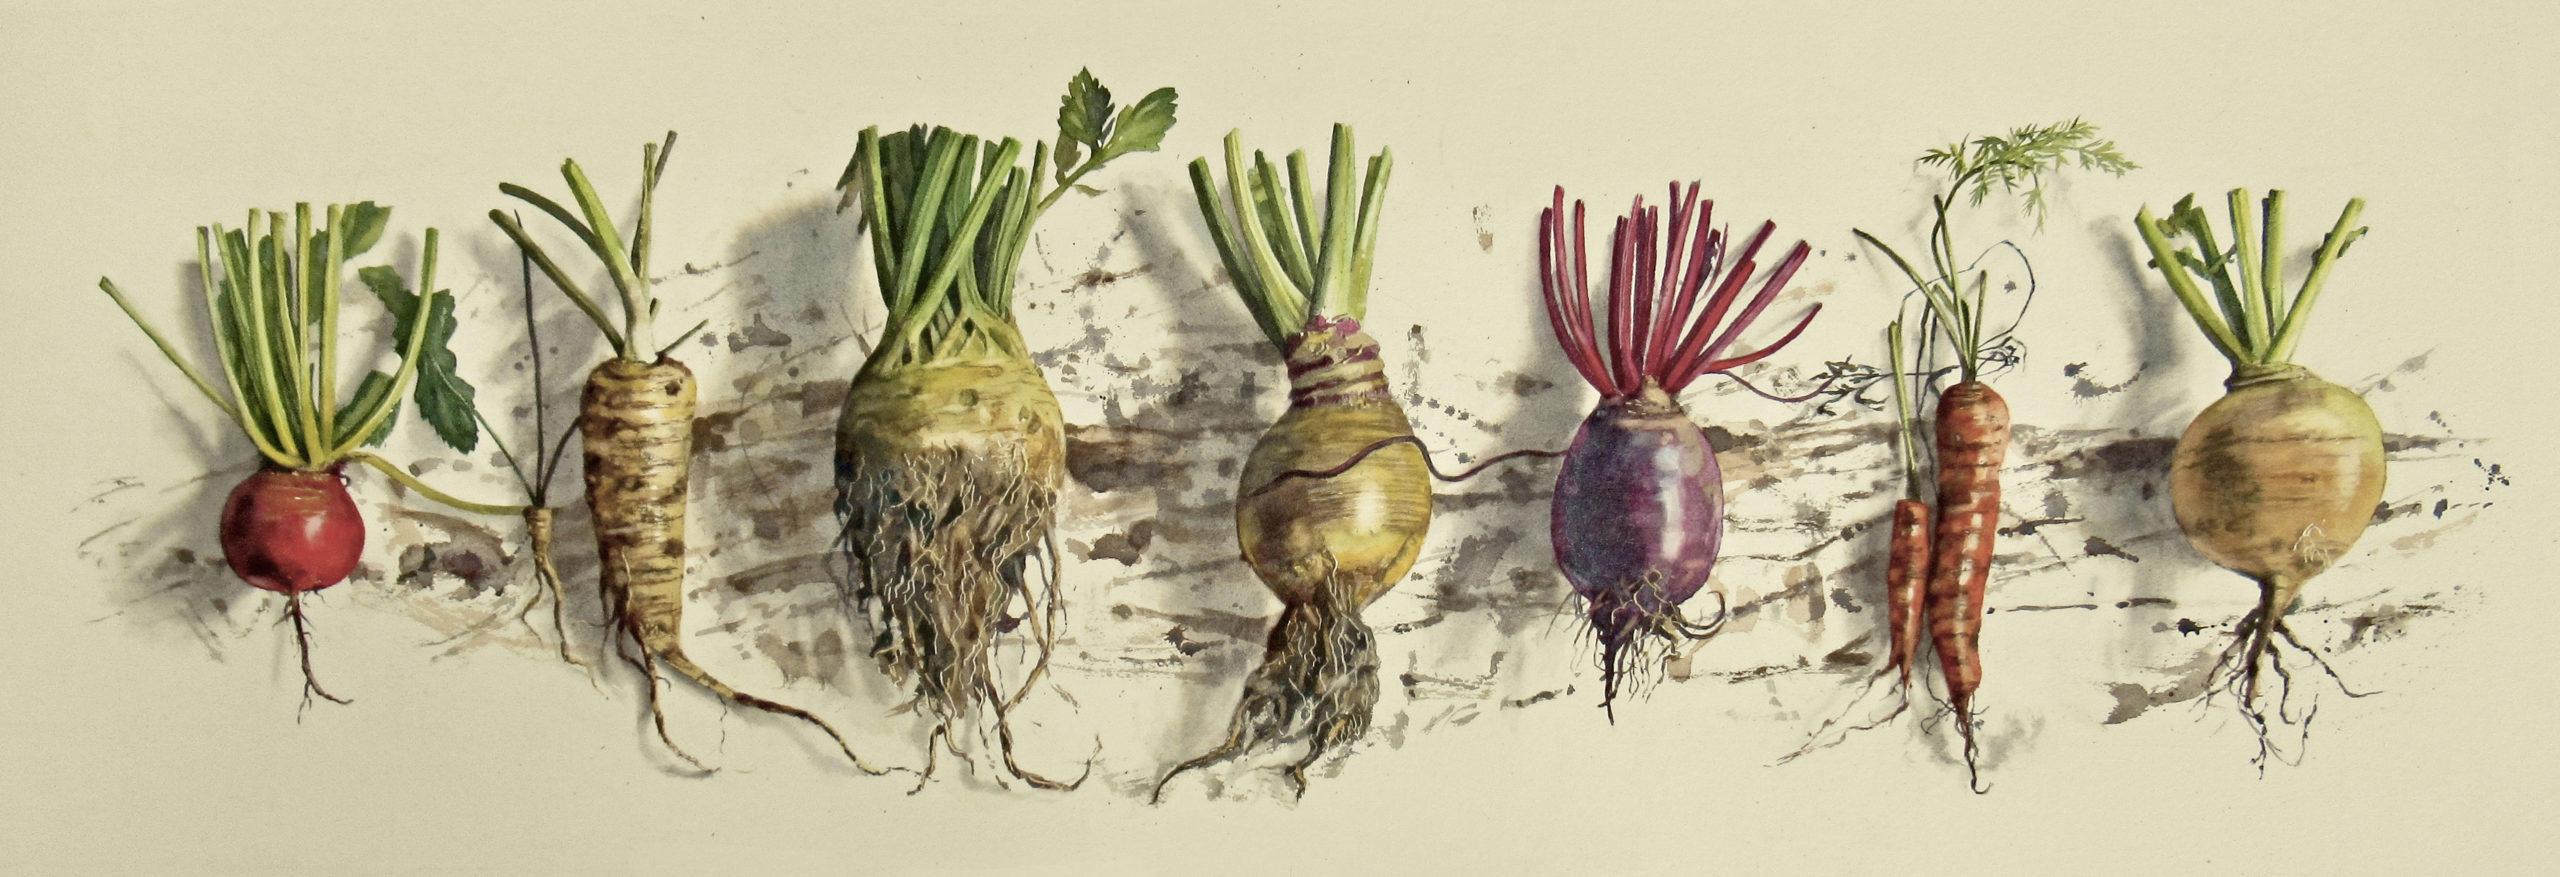 Fresh root veg 29 x 91cm